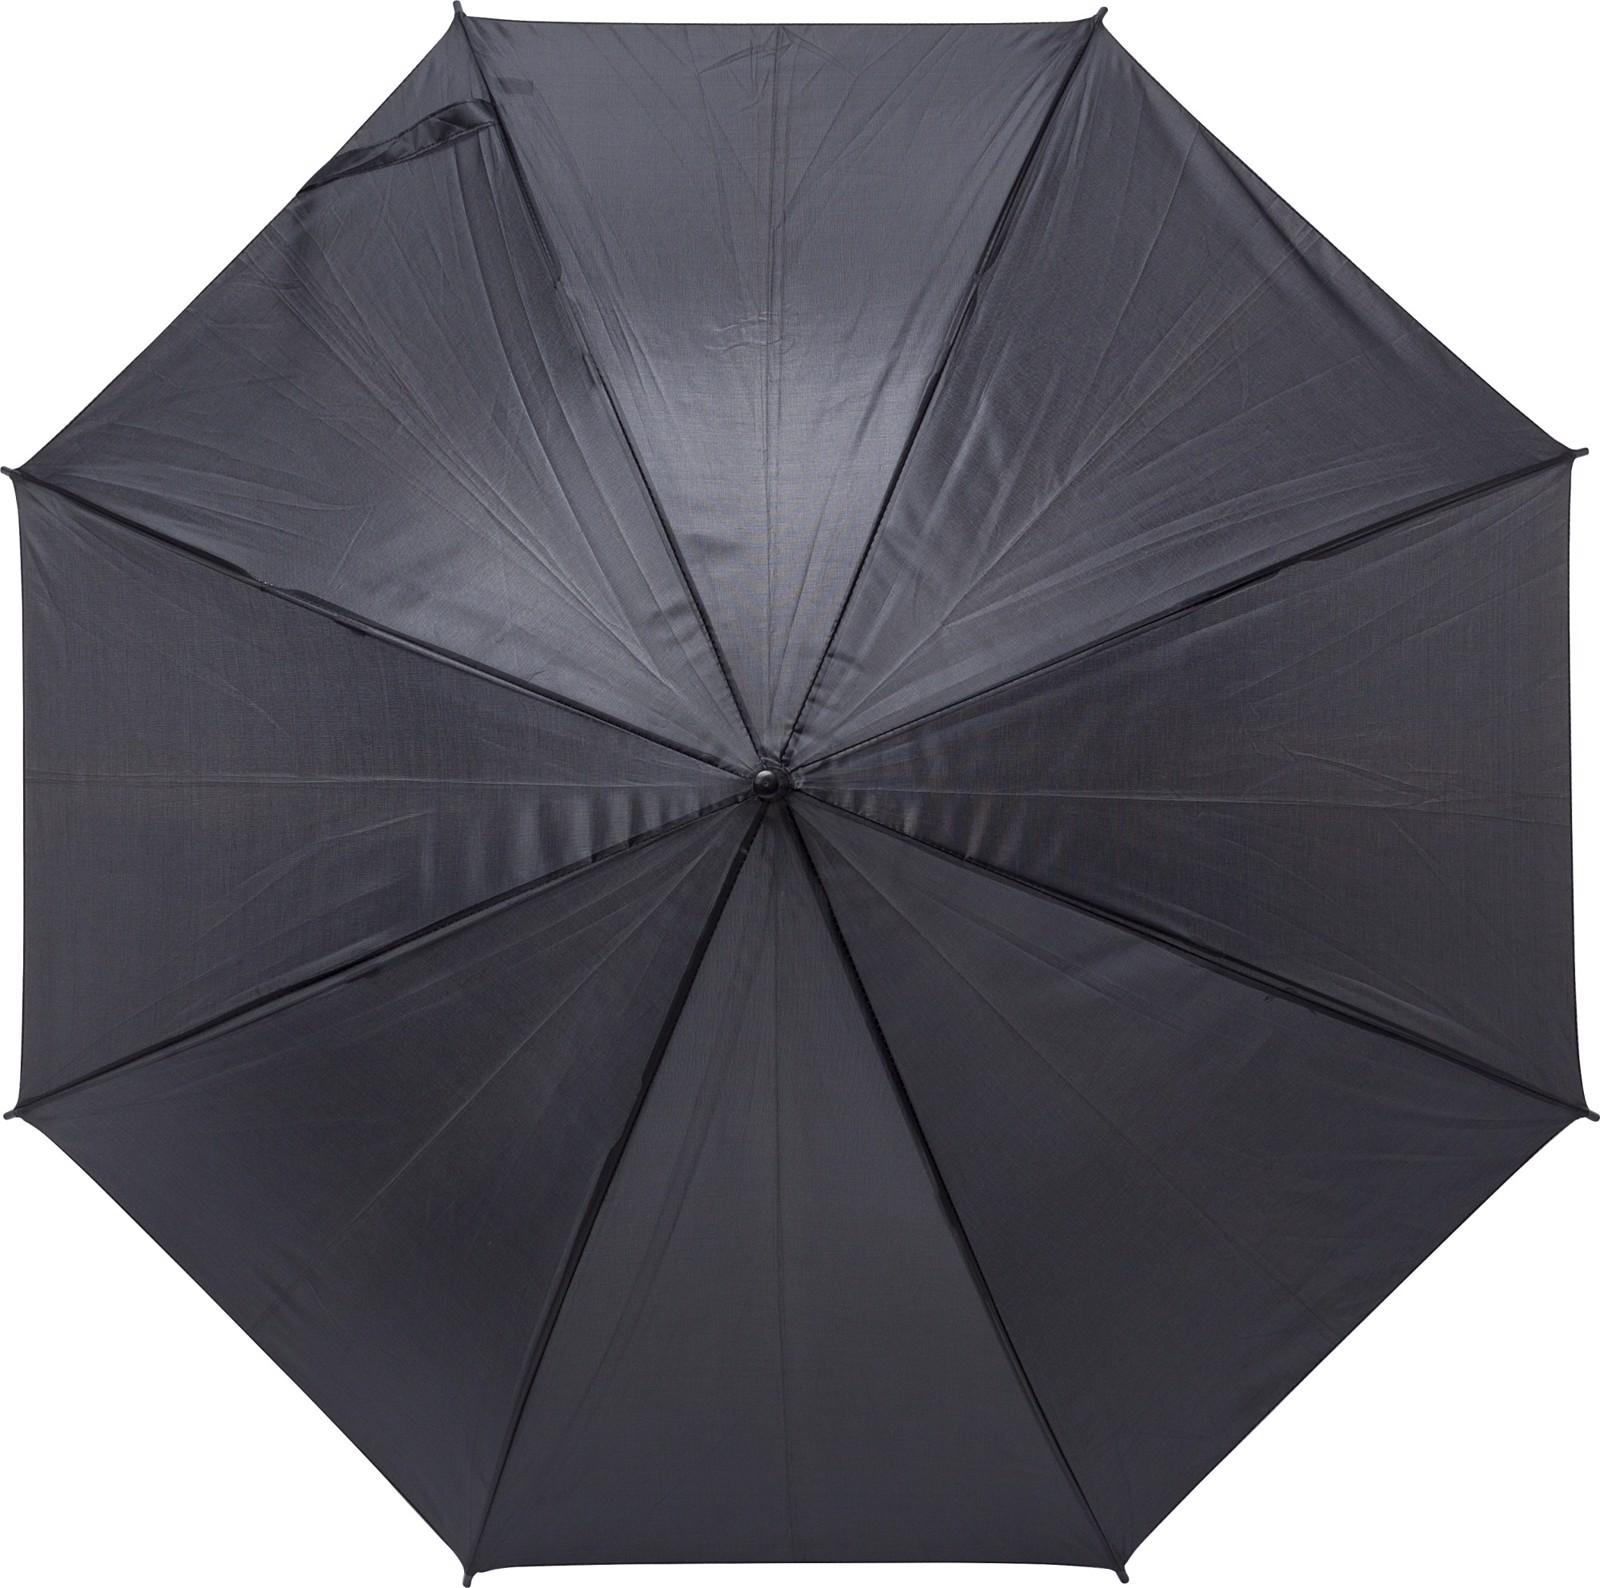 Polyester (170T) umbrella - Black